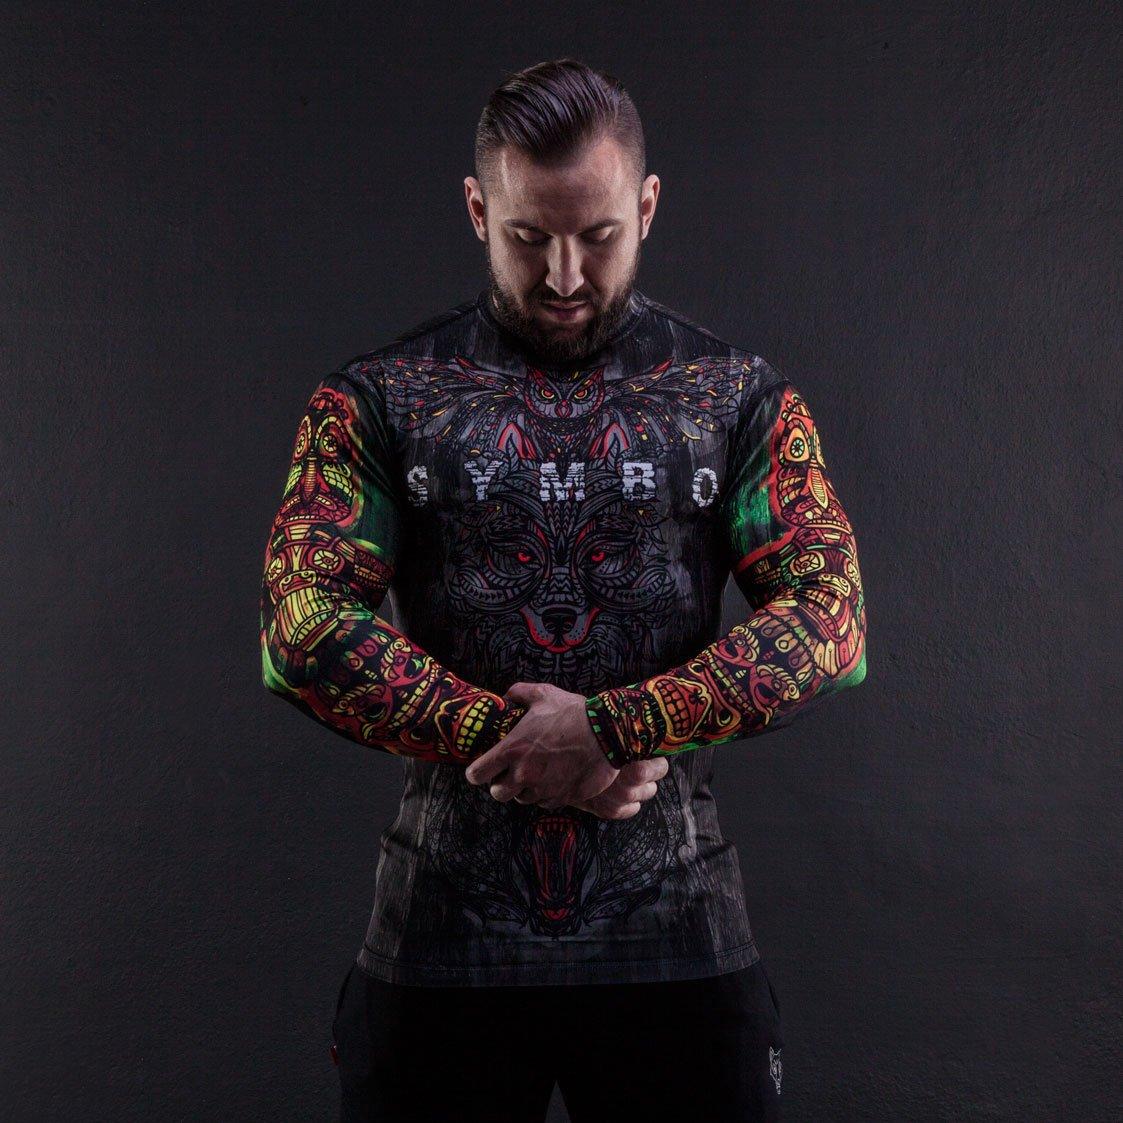 Symbo T-Shirt Herren Rashguard Totem thermoaktiv Kompression Sport Fitness Training Kampfsport MMA Langarm